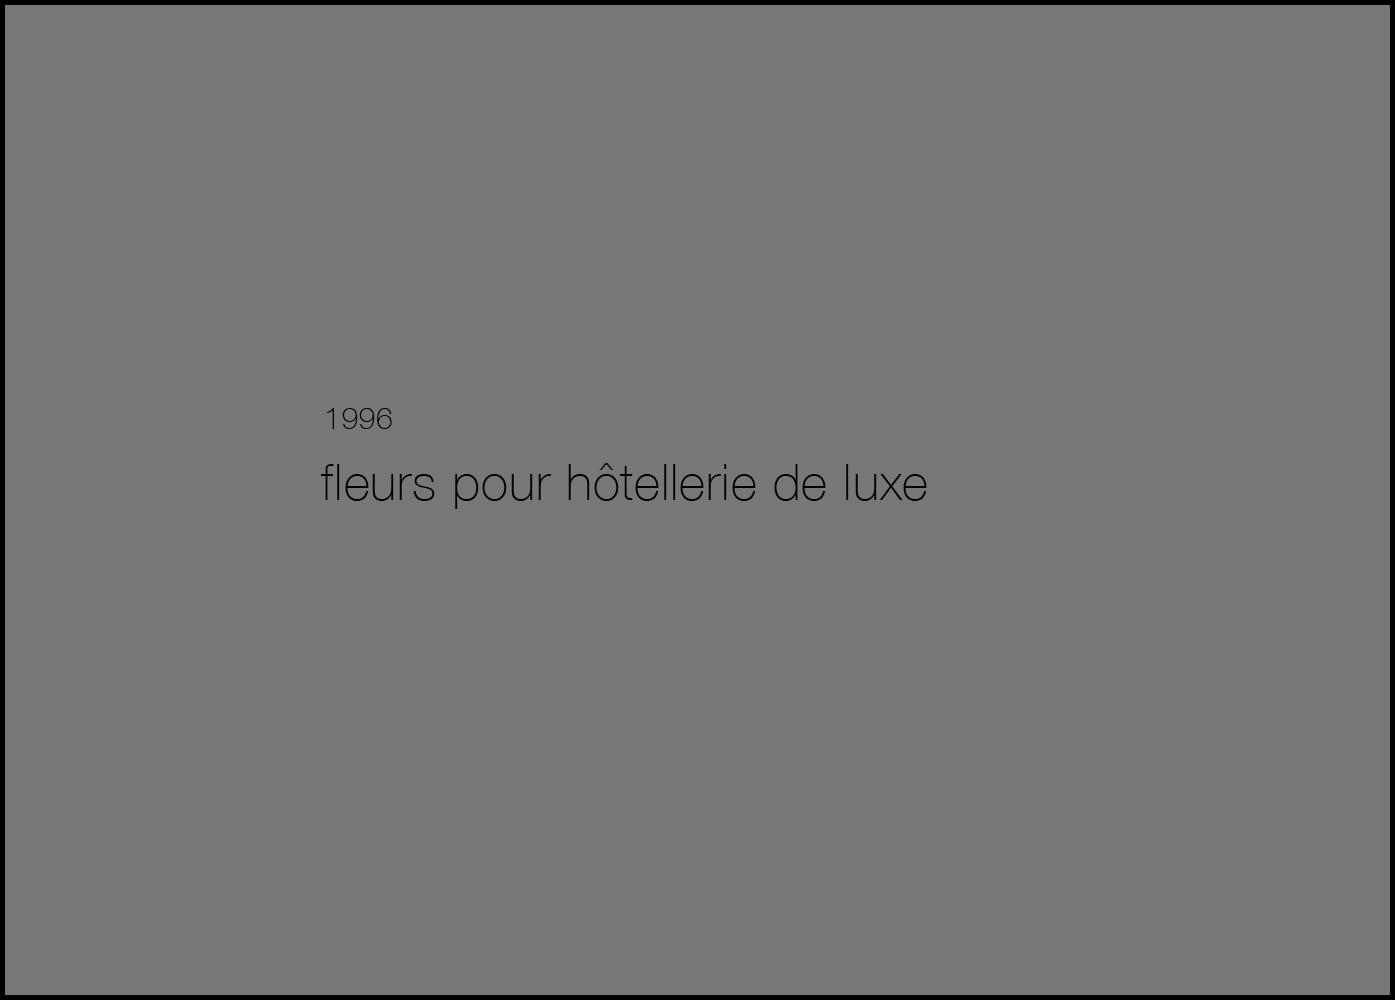 20_1996-Jeannot-Fleurs00